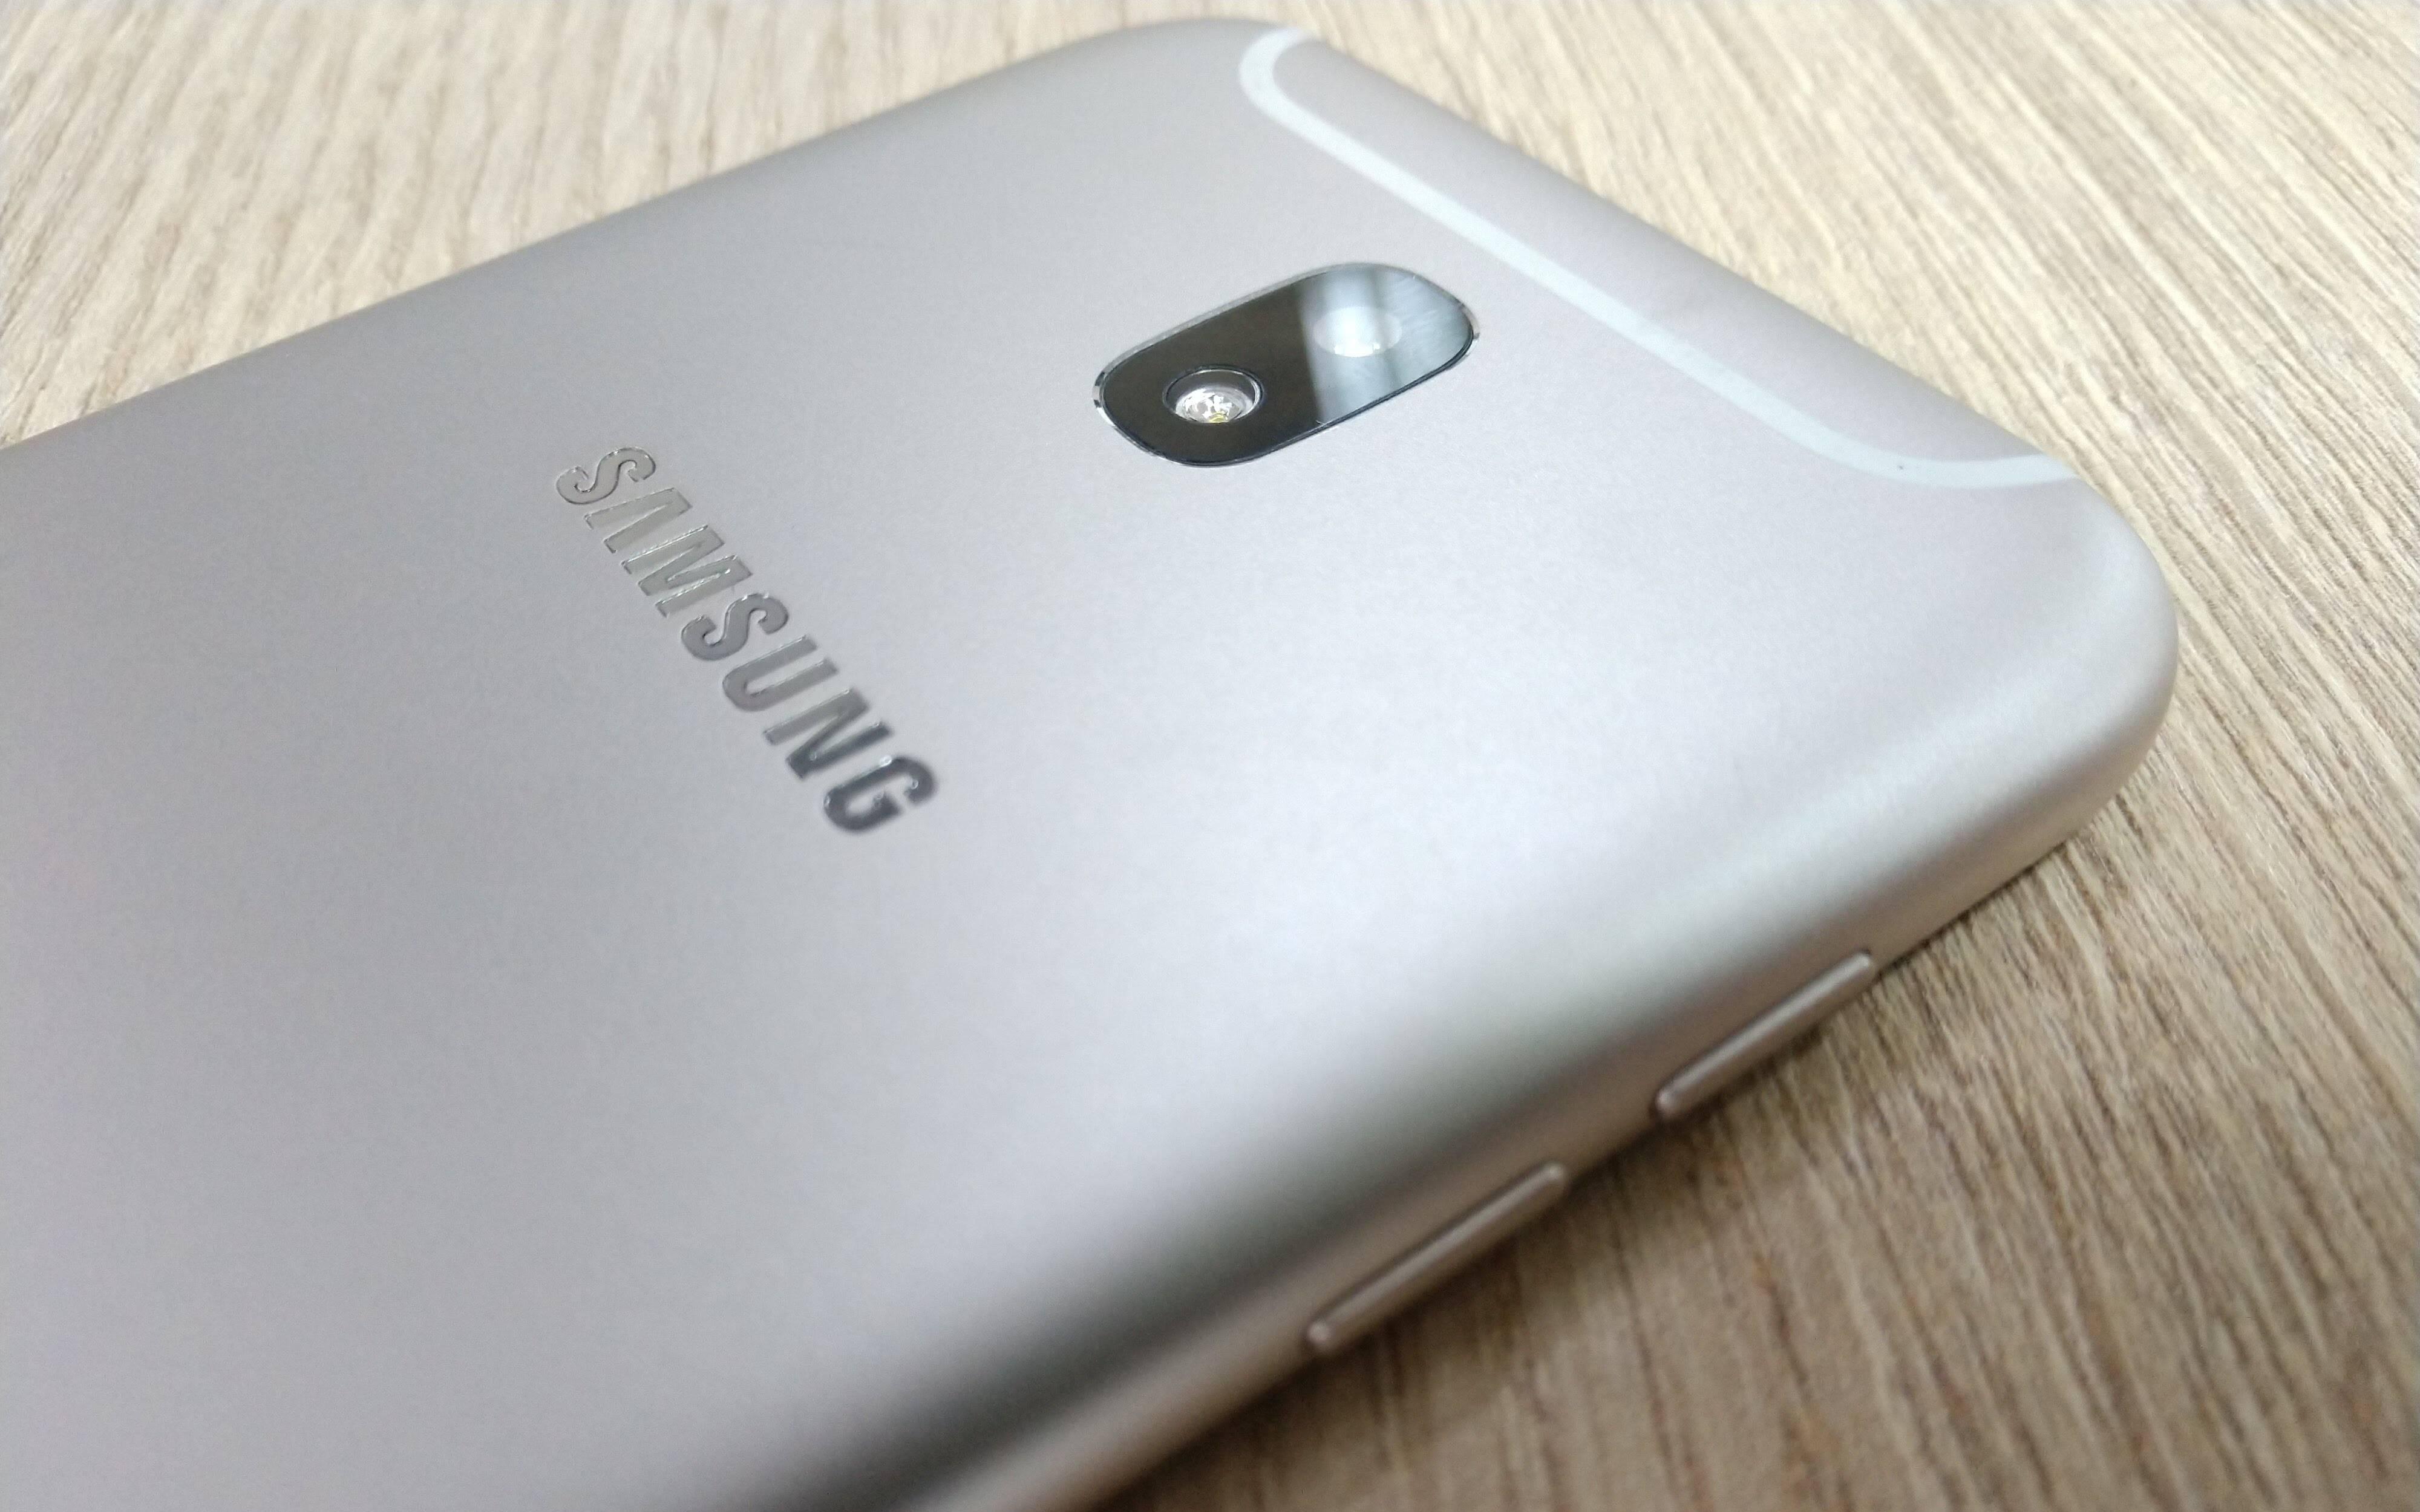 Galaxy J5 Pro conta com câmera traseira de 13 megapixels com flash LED. Foto: Victor Hugo Silva/Brasil Econômico